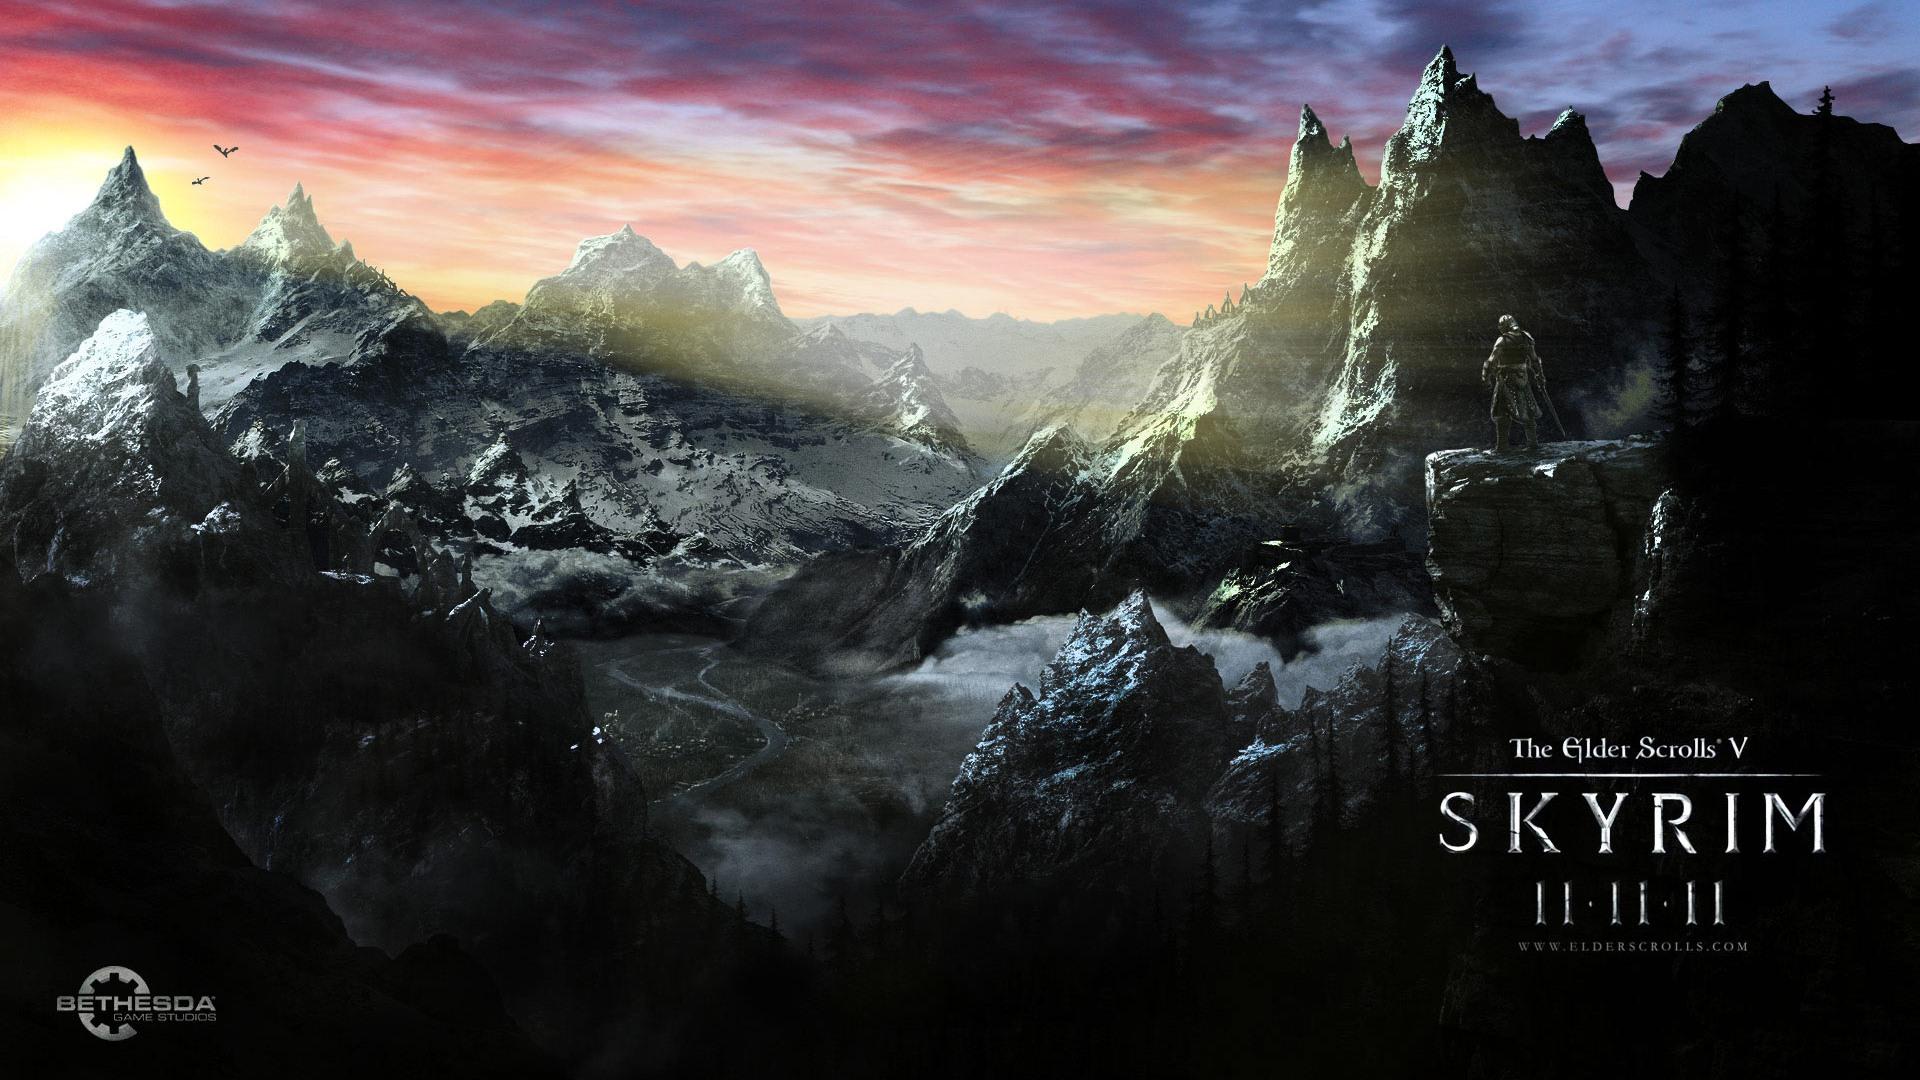 The Elder Scrolls V: Skyrim HD Wallpapers #15